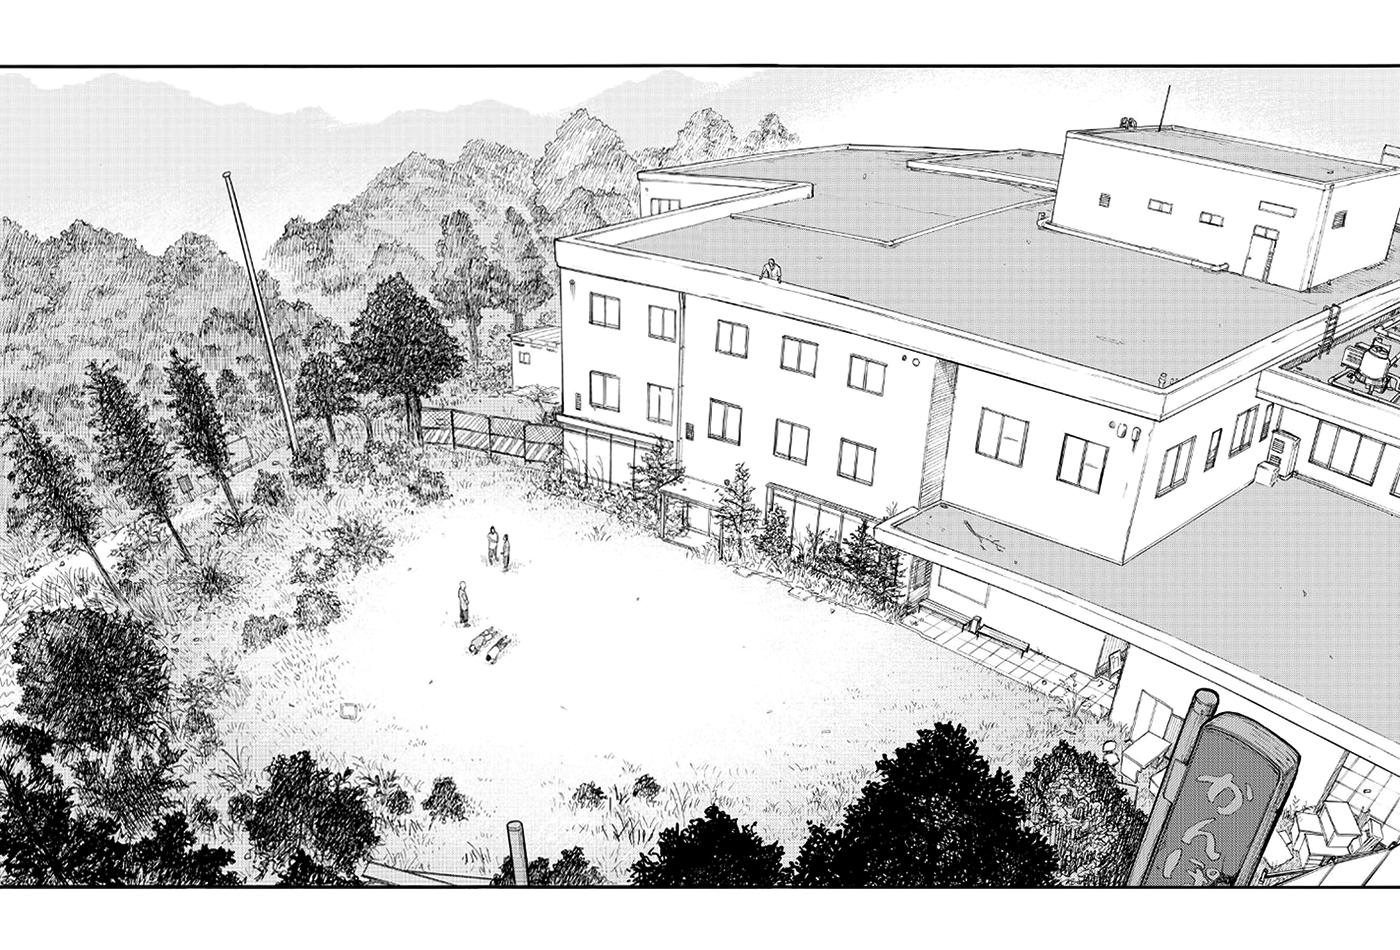 Ajin Chapter 25 - Hamtruyen.vn